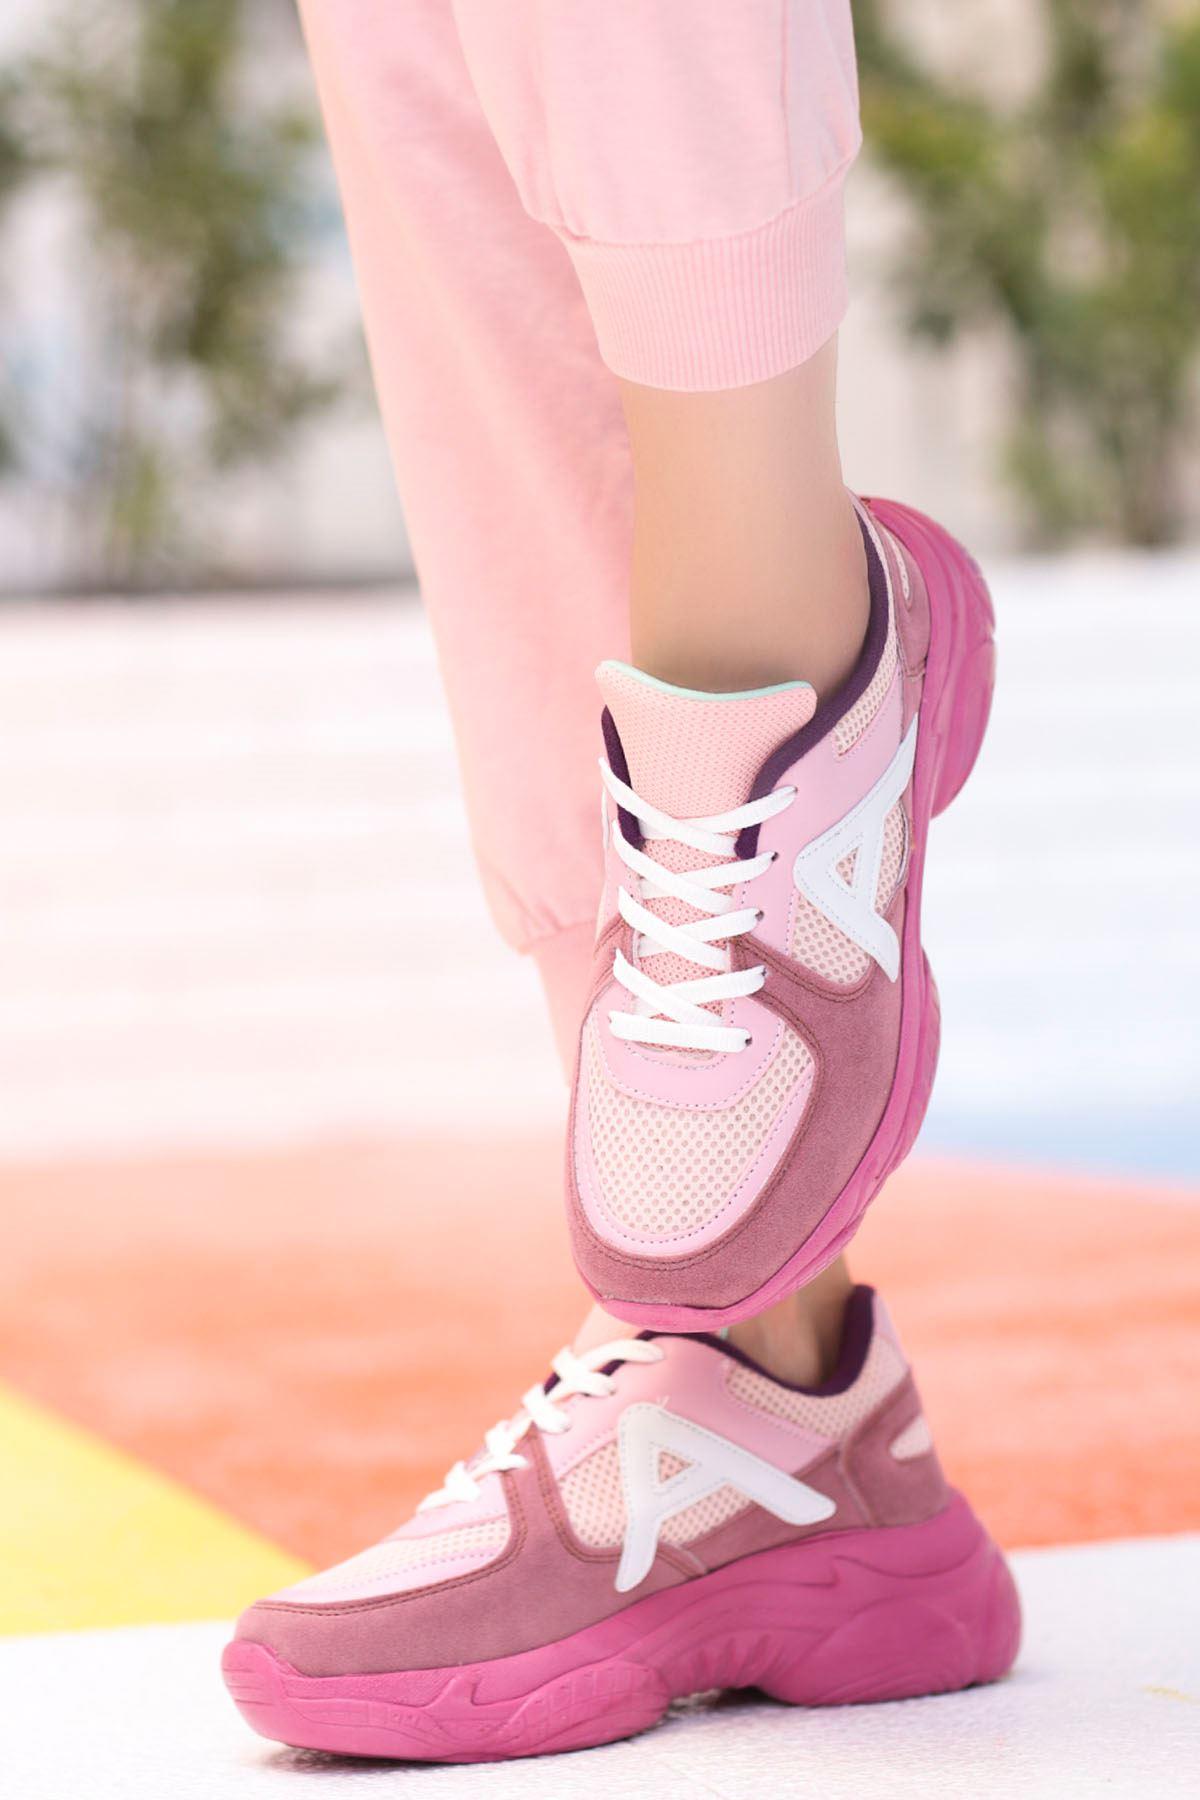 Afra A Detay Spor Ayakkabı Pudra Fuşya Detay